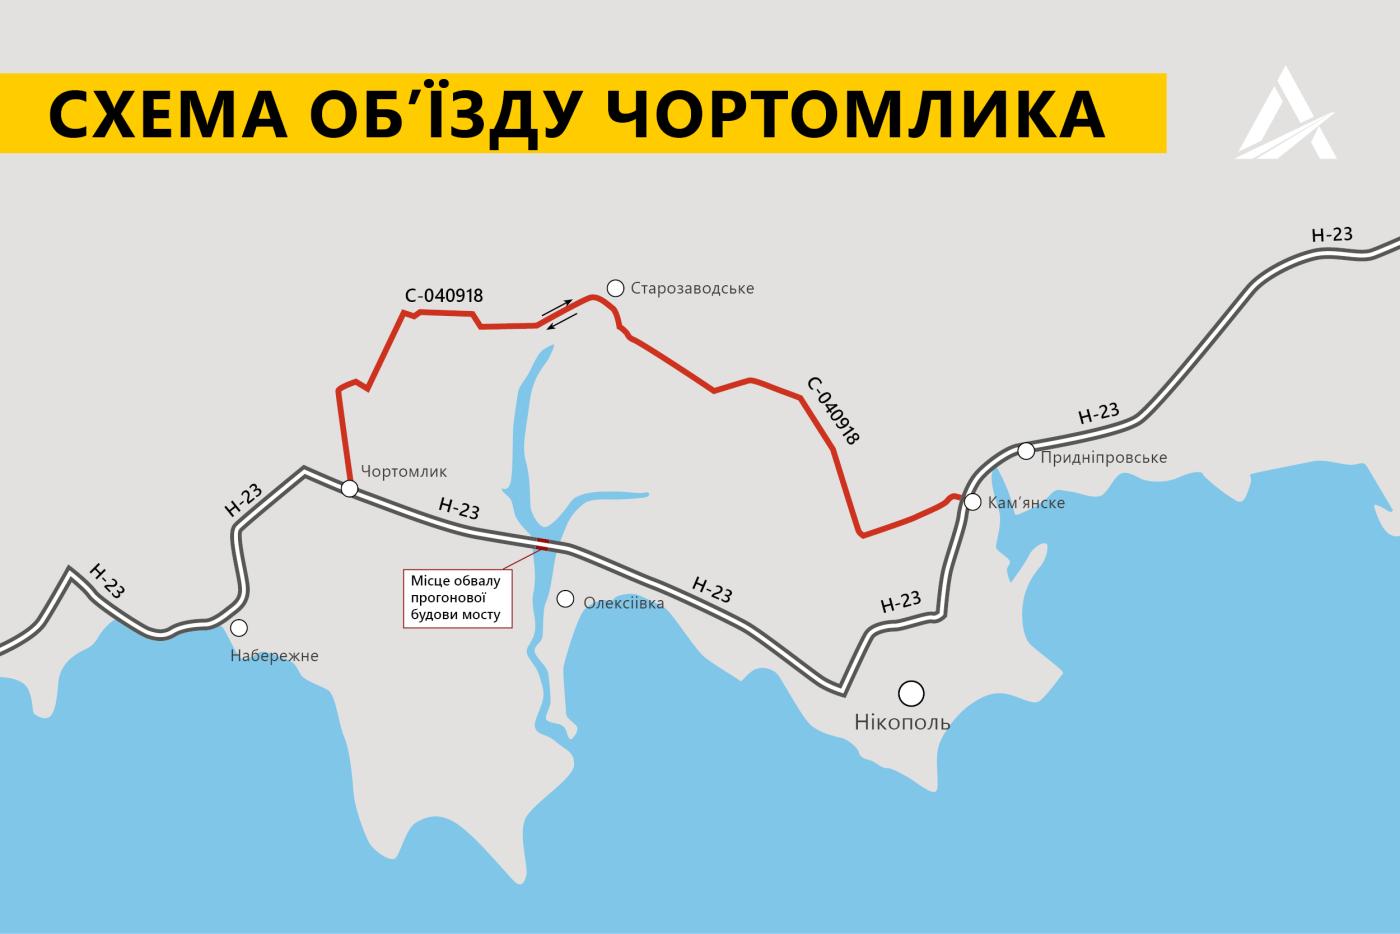 В Днепропетровской области рухнул мост вместе с фурой, - ФОТО, фото-3